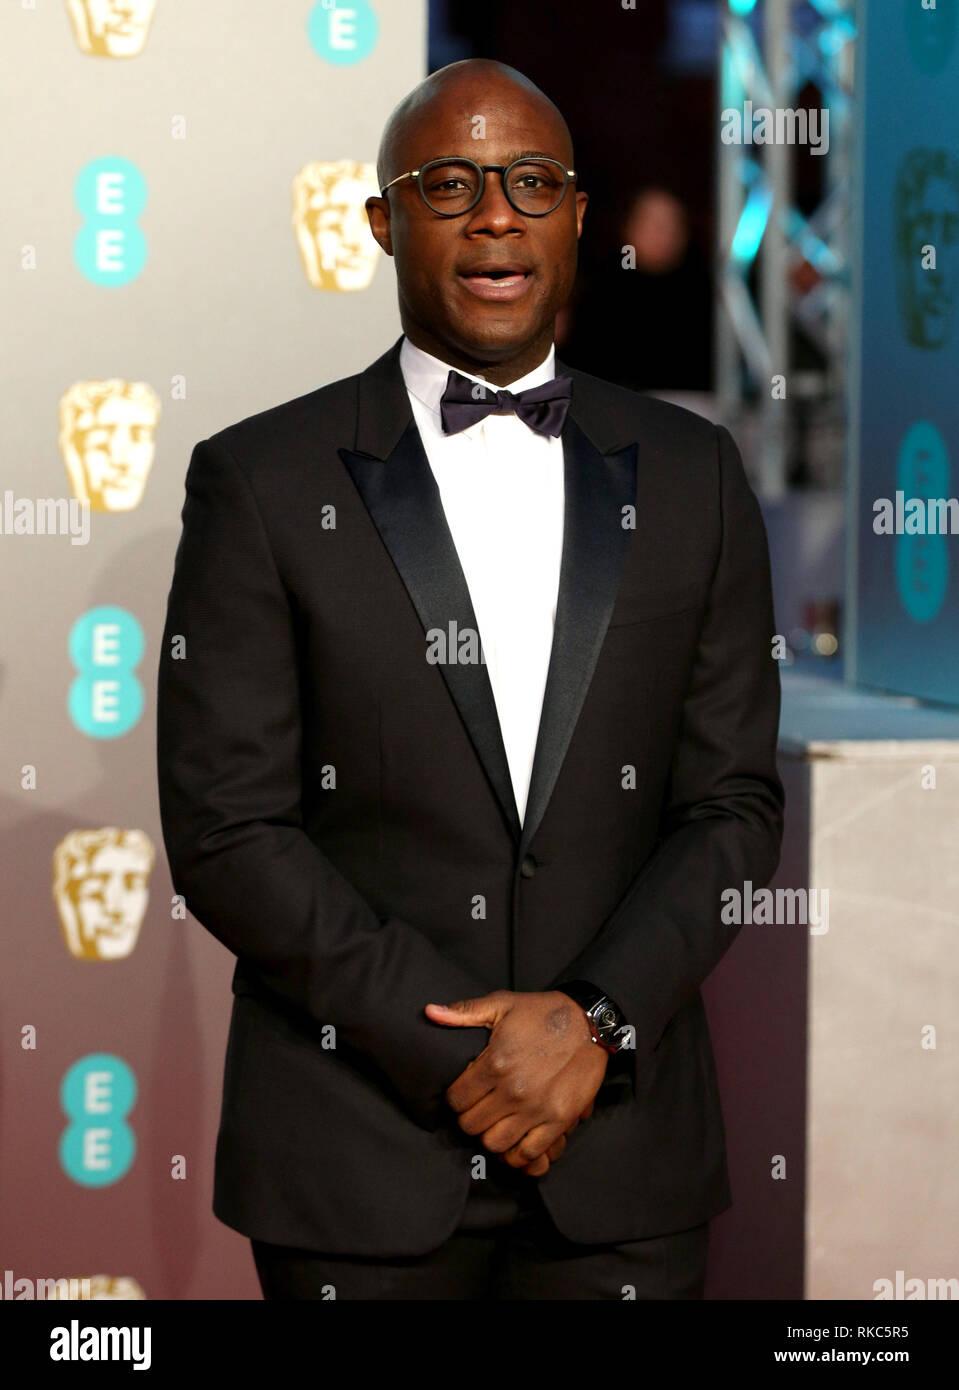 Barry Jenkins attending the 72nd British Academy Film Awards held at the Royal Albert Hall, Kensington Gore, Kensington, London. - Stock Image